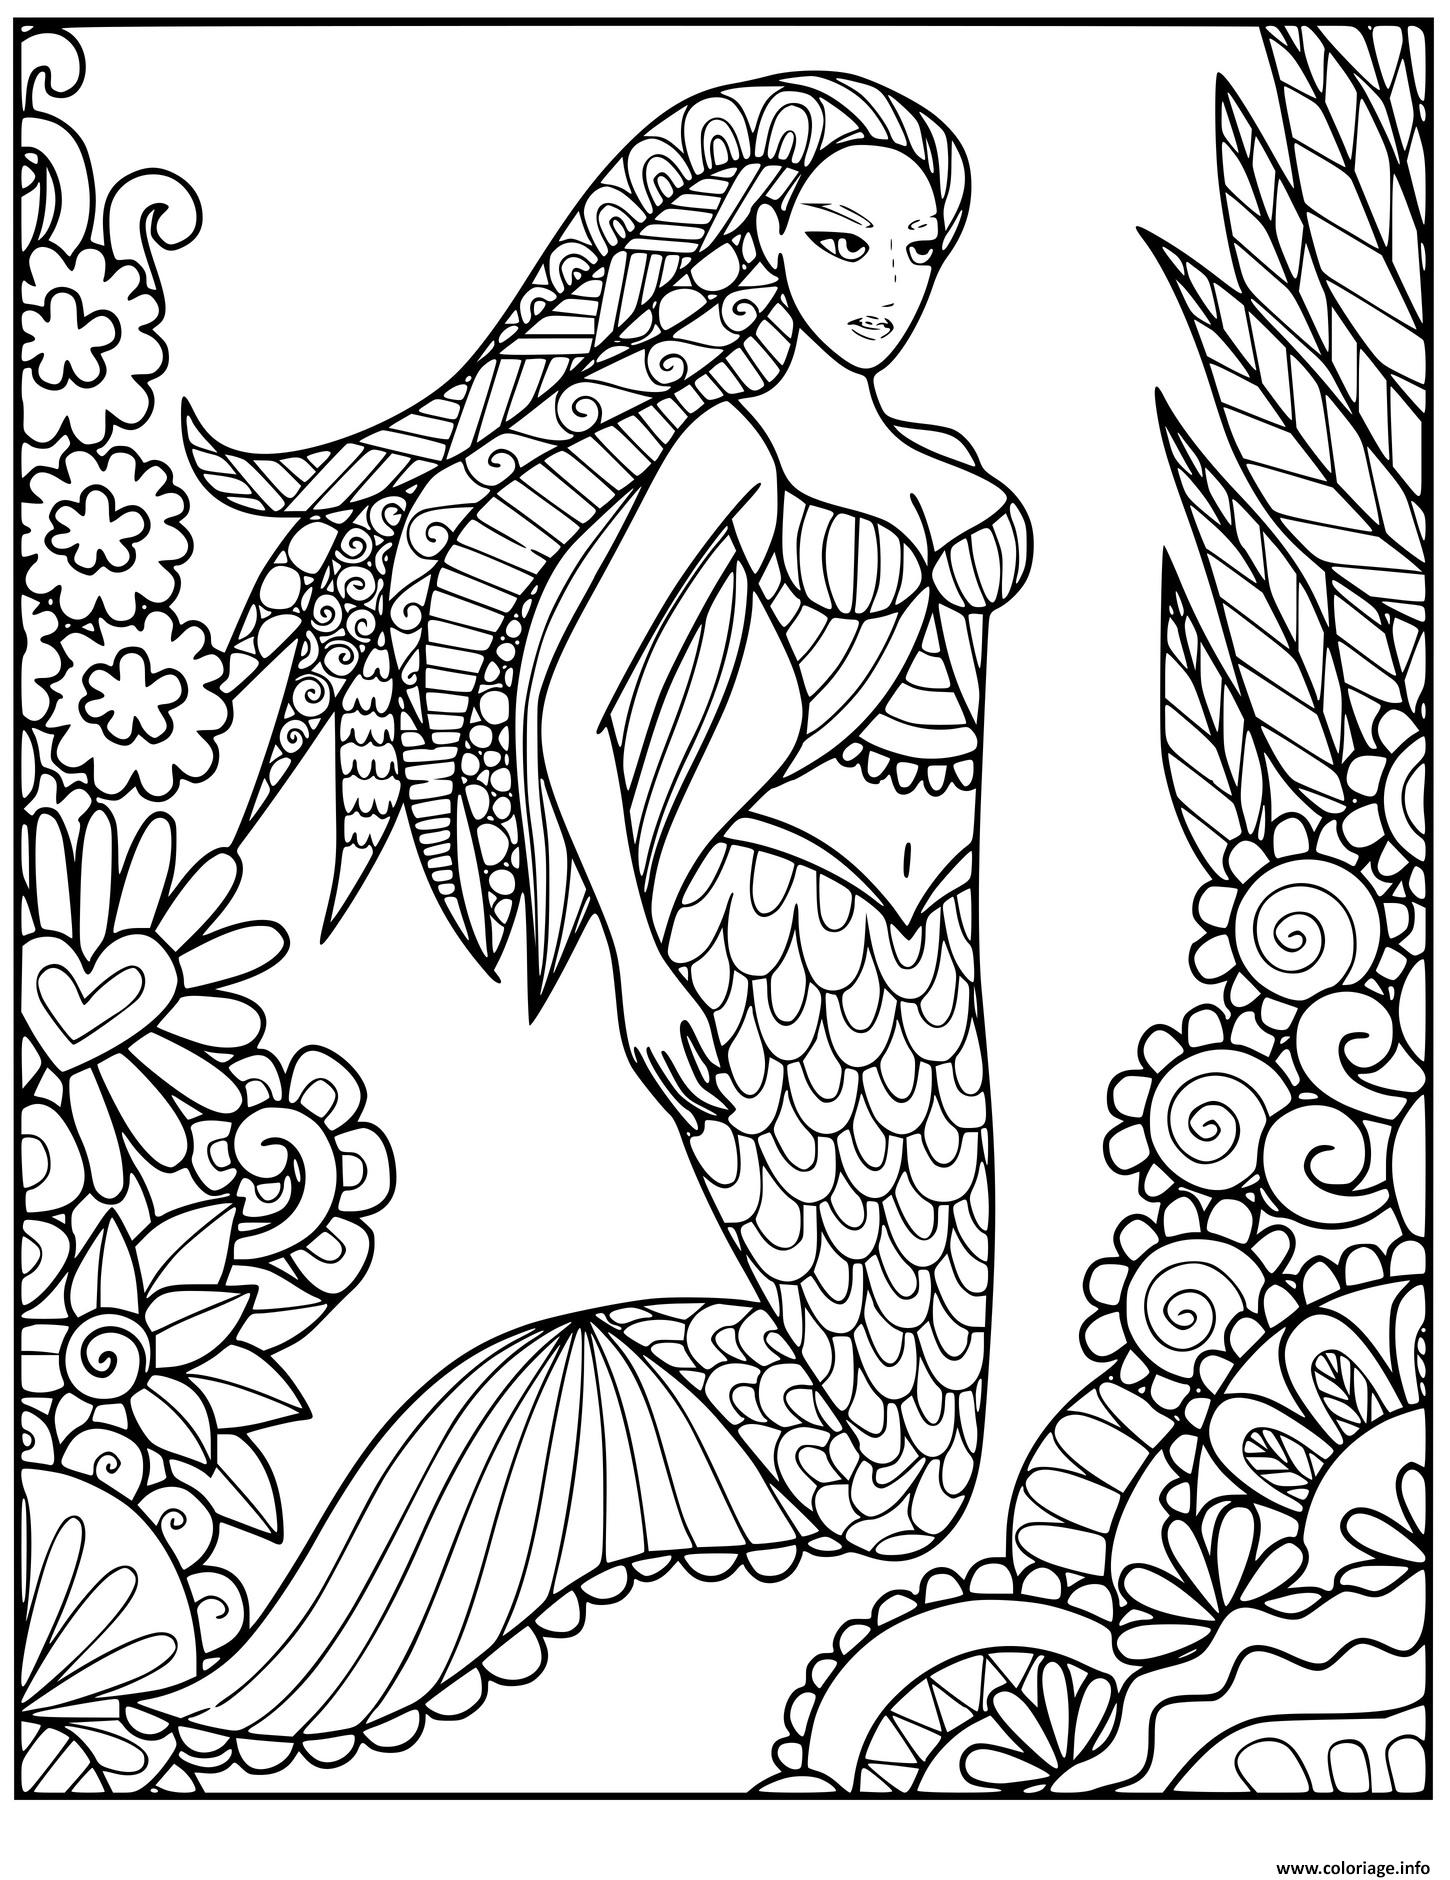 Coloriage Sirene Dans La Mer Avec La Vegetation Dessin ...